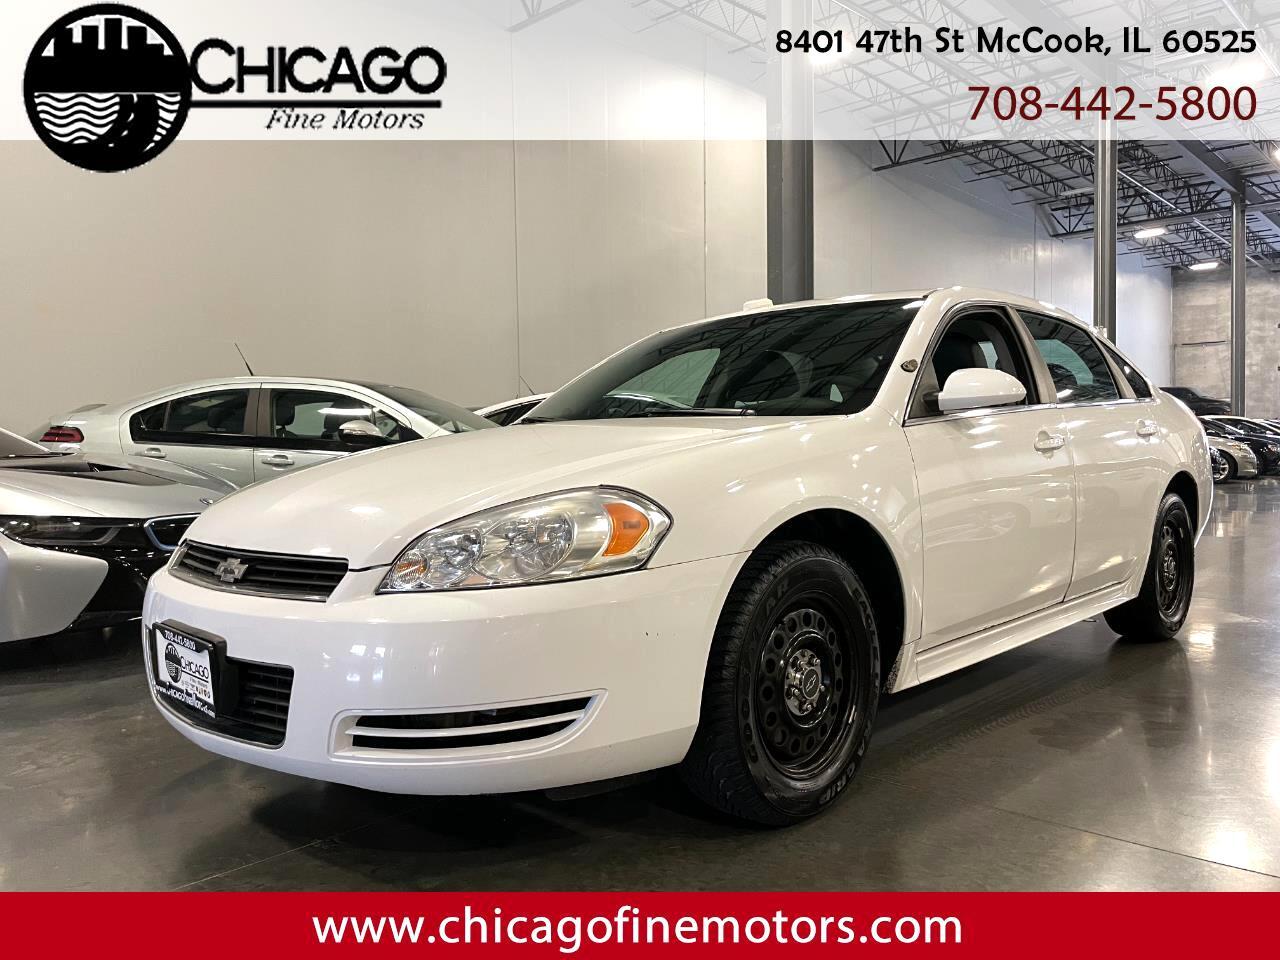 Chevrolet Impala Police Cruiser 2011